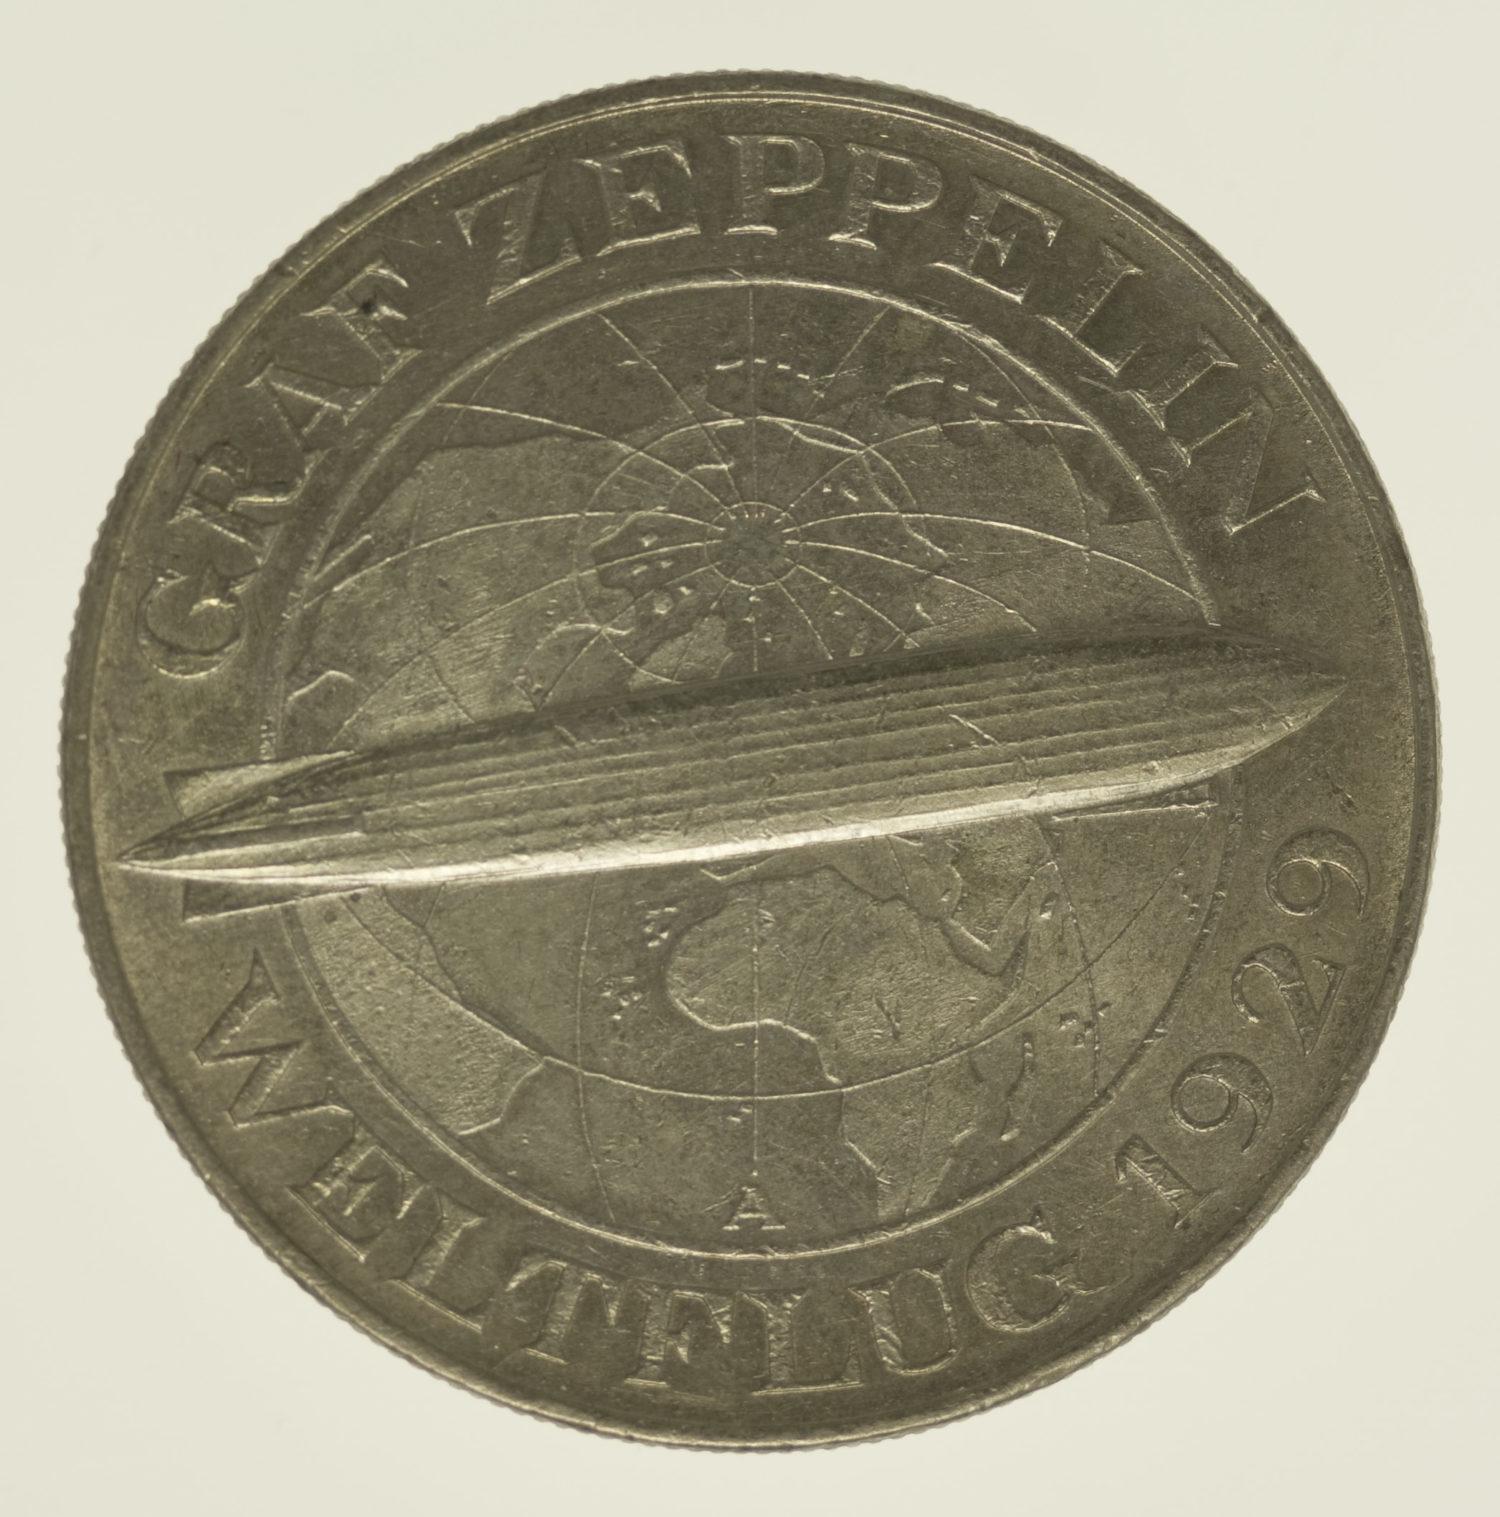 weimarer-republik-deutsche-silbermuenzen - Weimarer Republik 5 Reichsmark 1930 Zeppelin